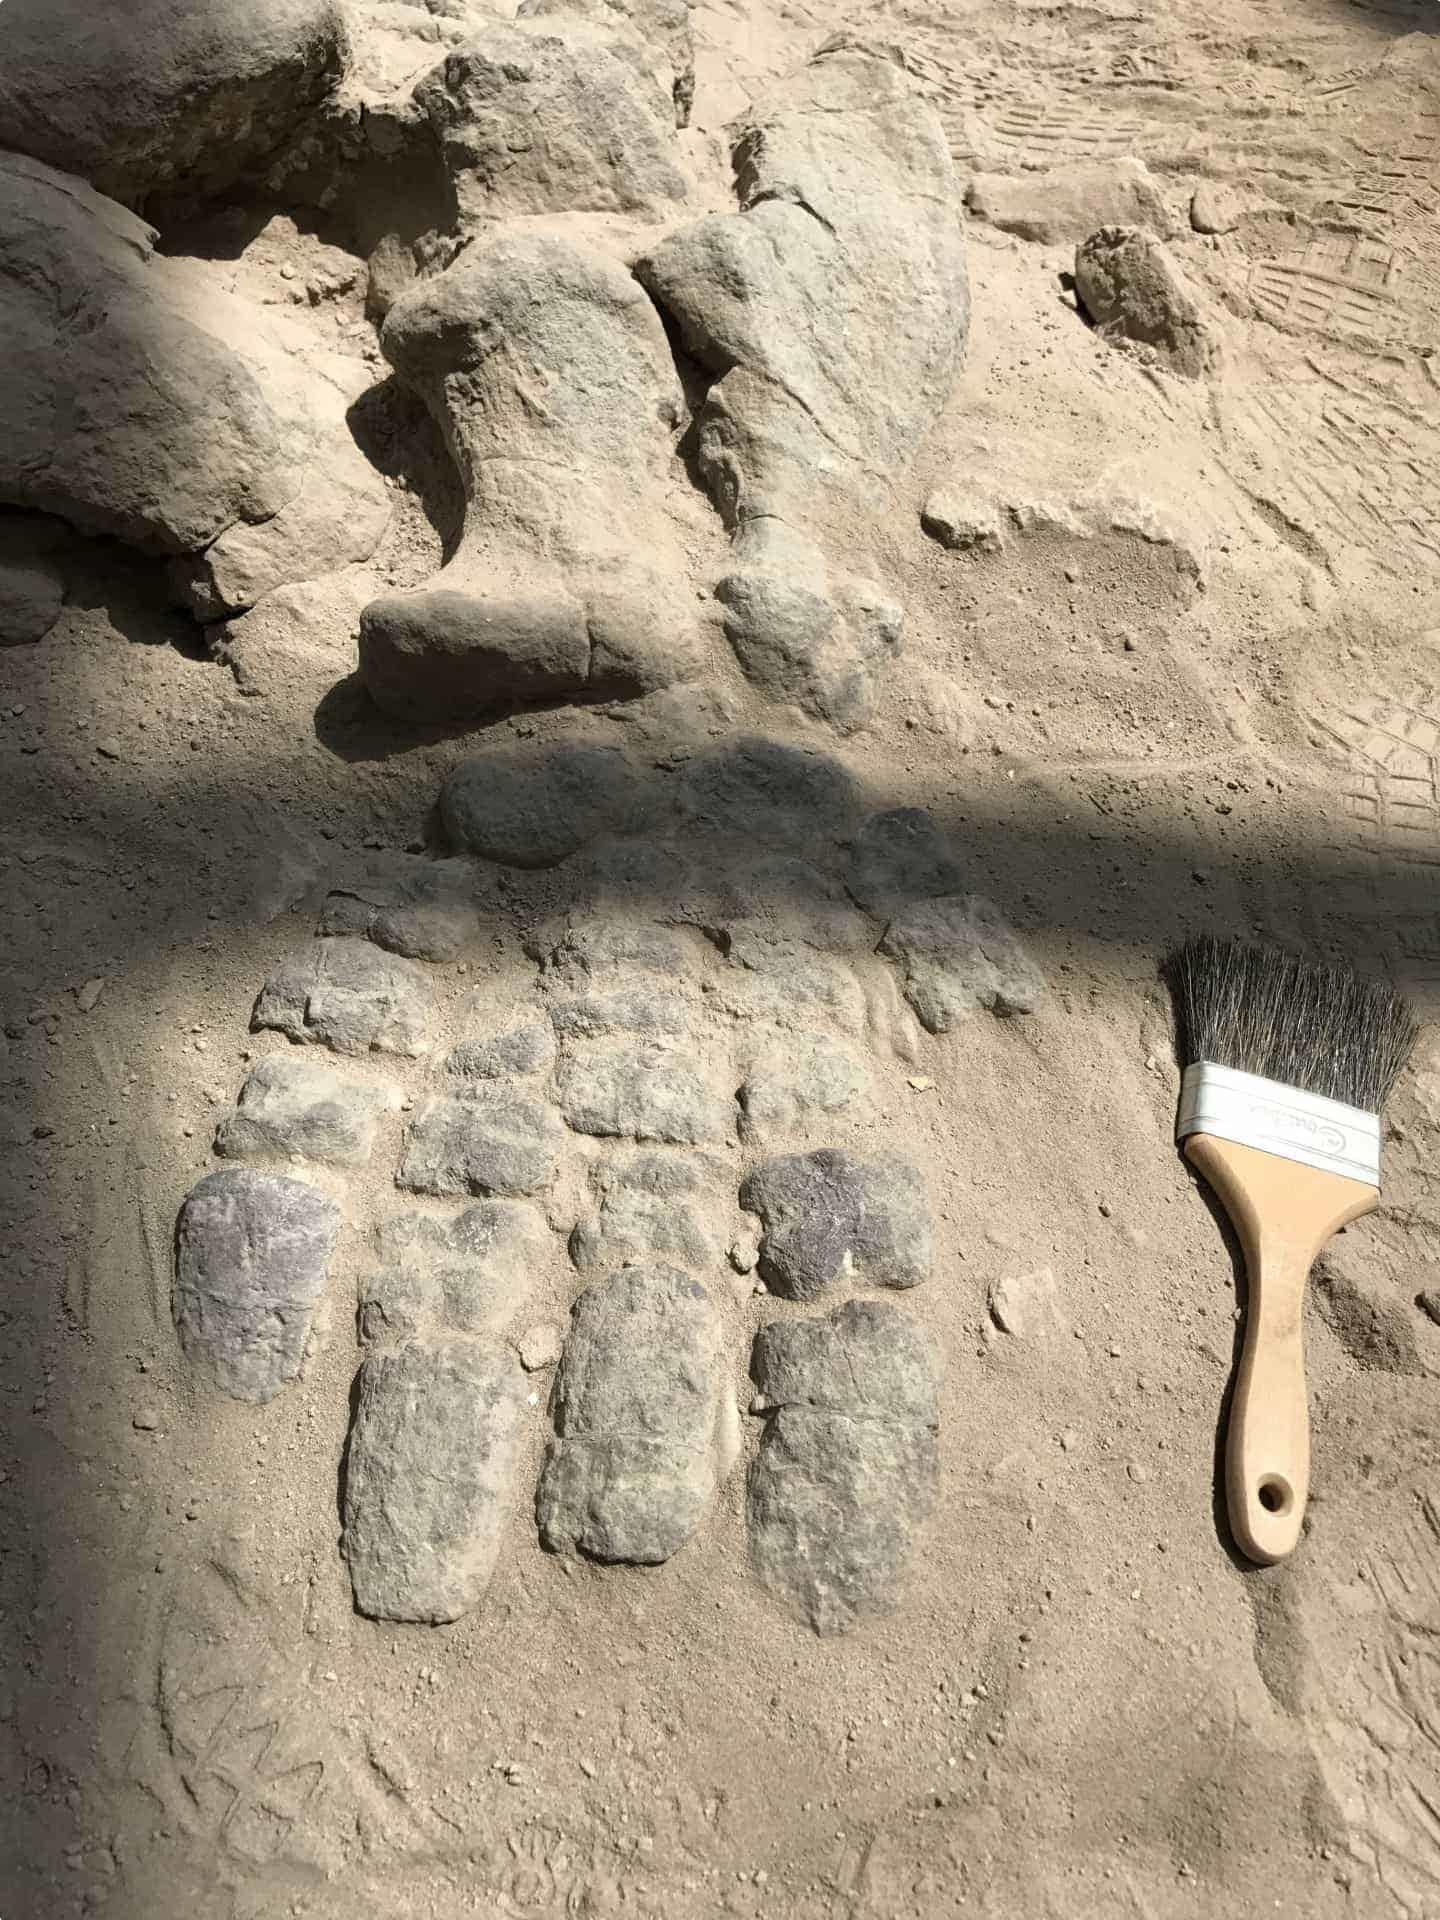 Foot of a mammal-like reptile: Ischigualastia